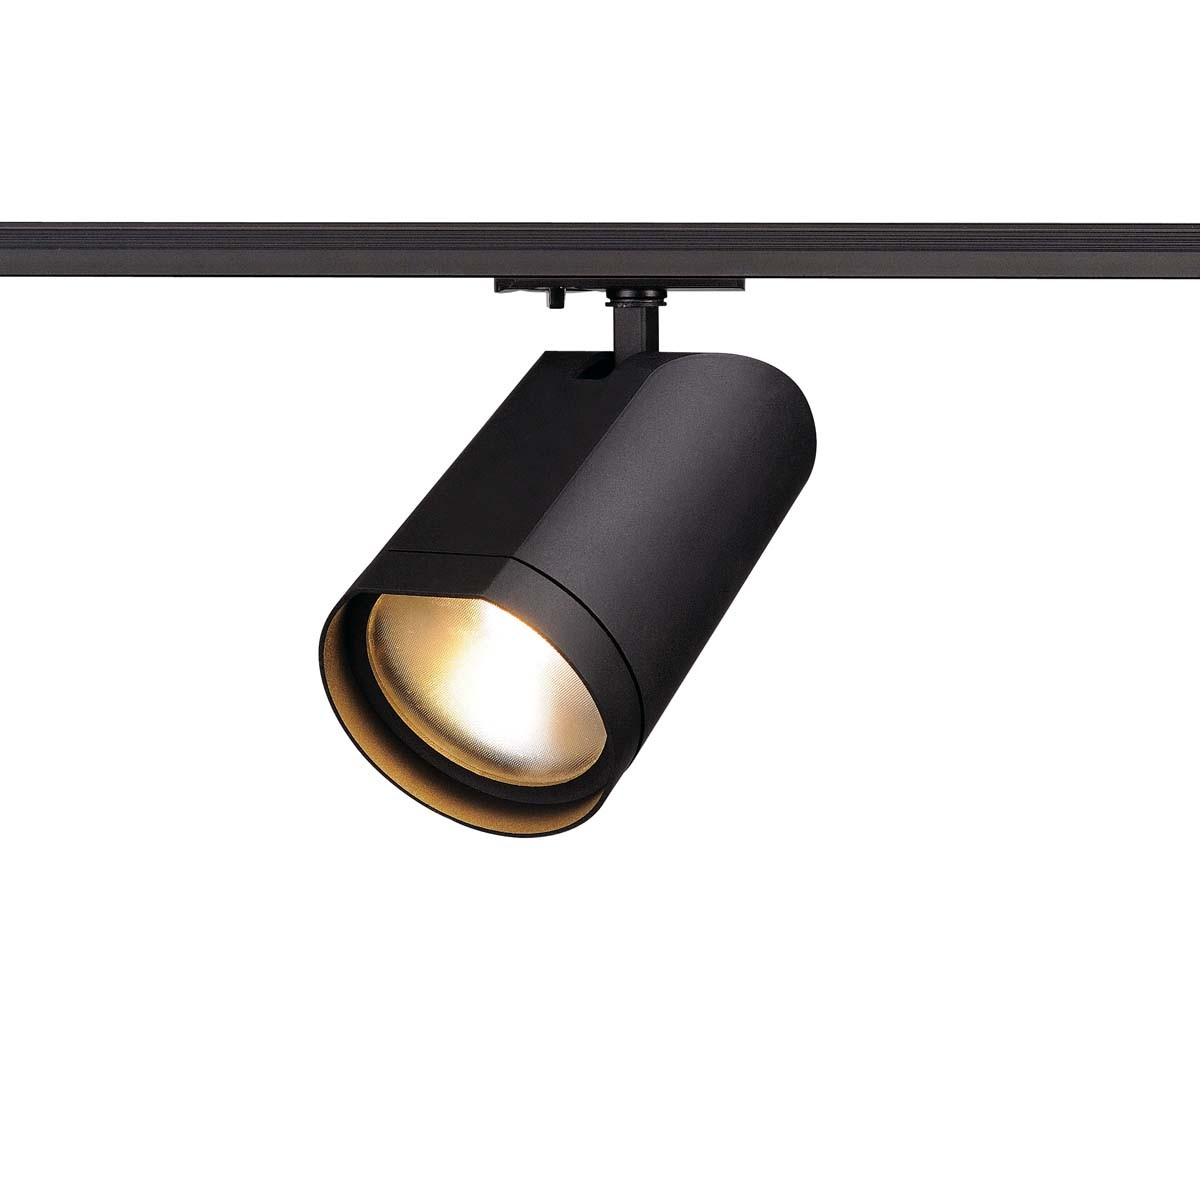 SLV 143560 Bilas LED Spot 15W 2700K 1 Circuit 240v Track Light Matt Black